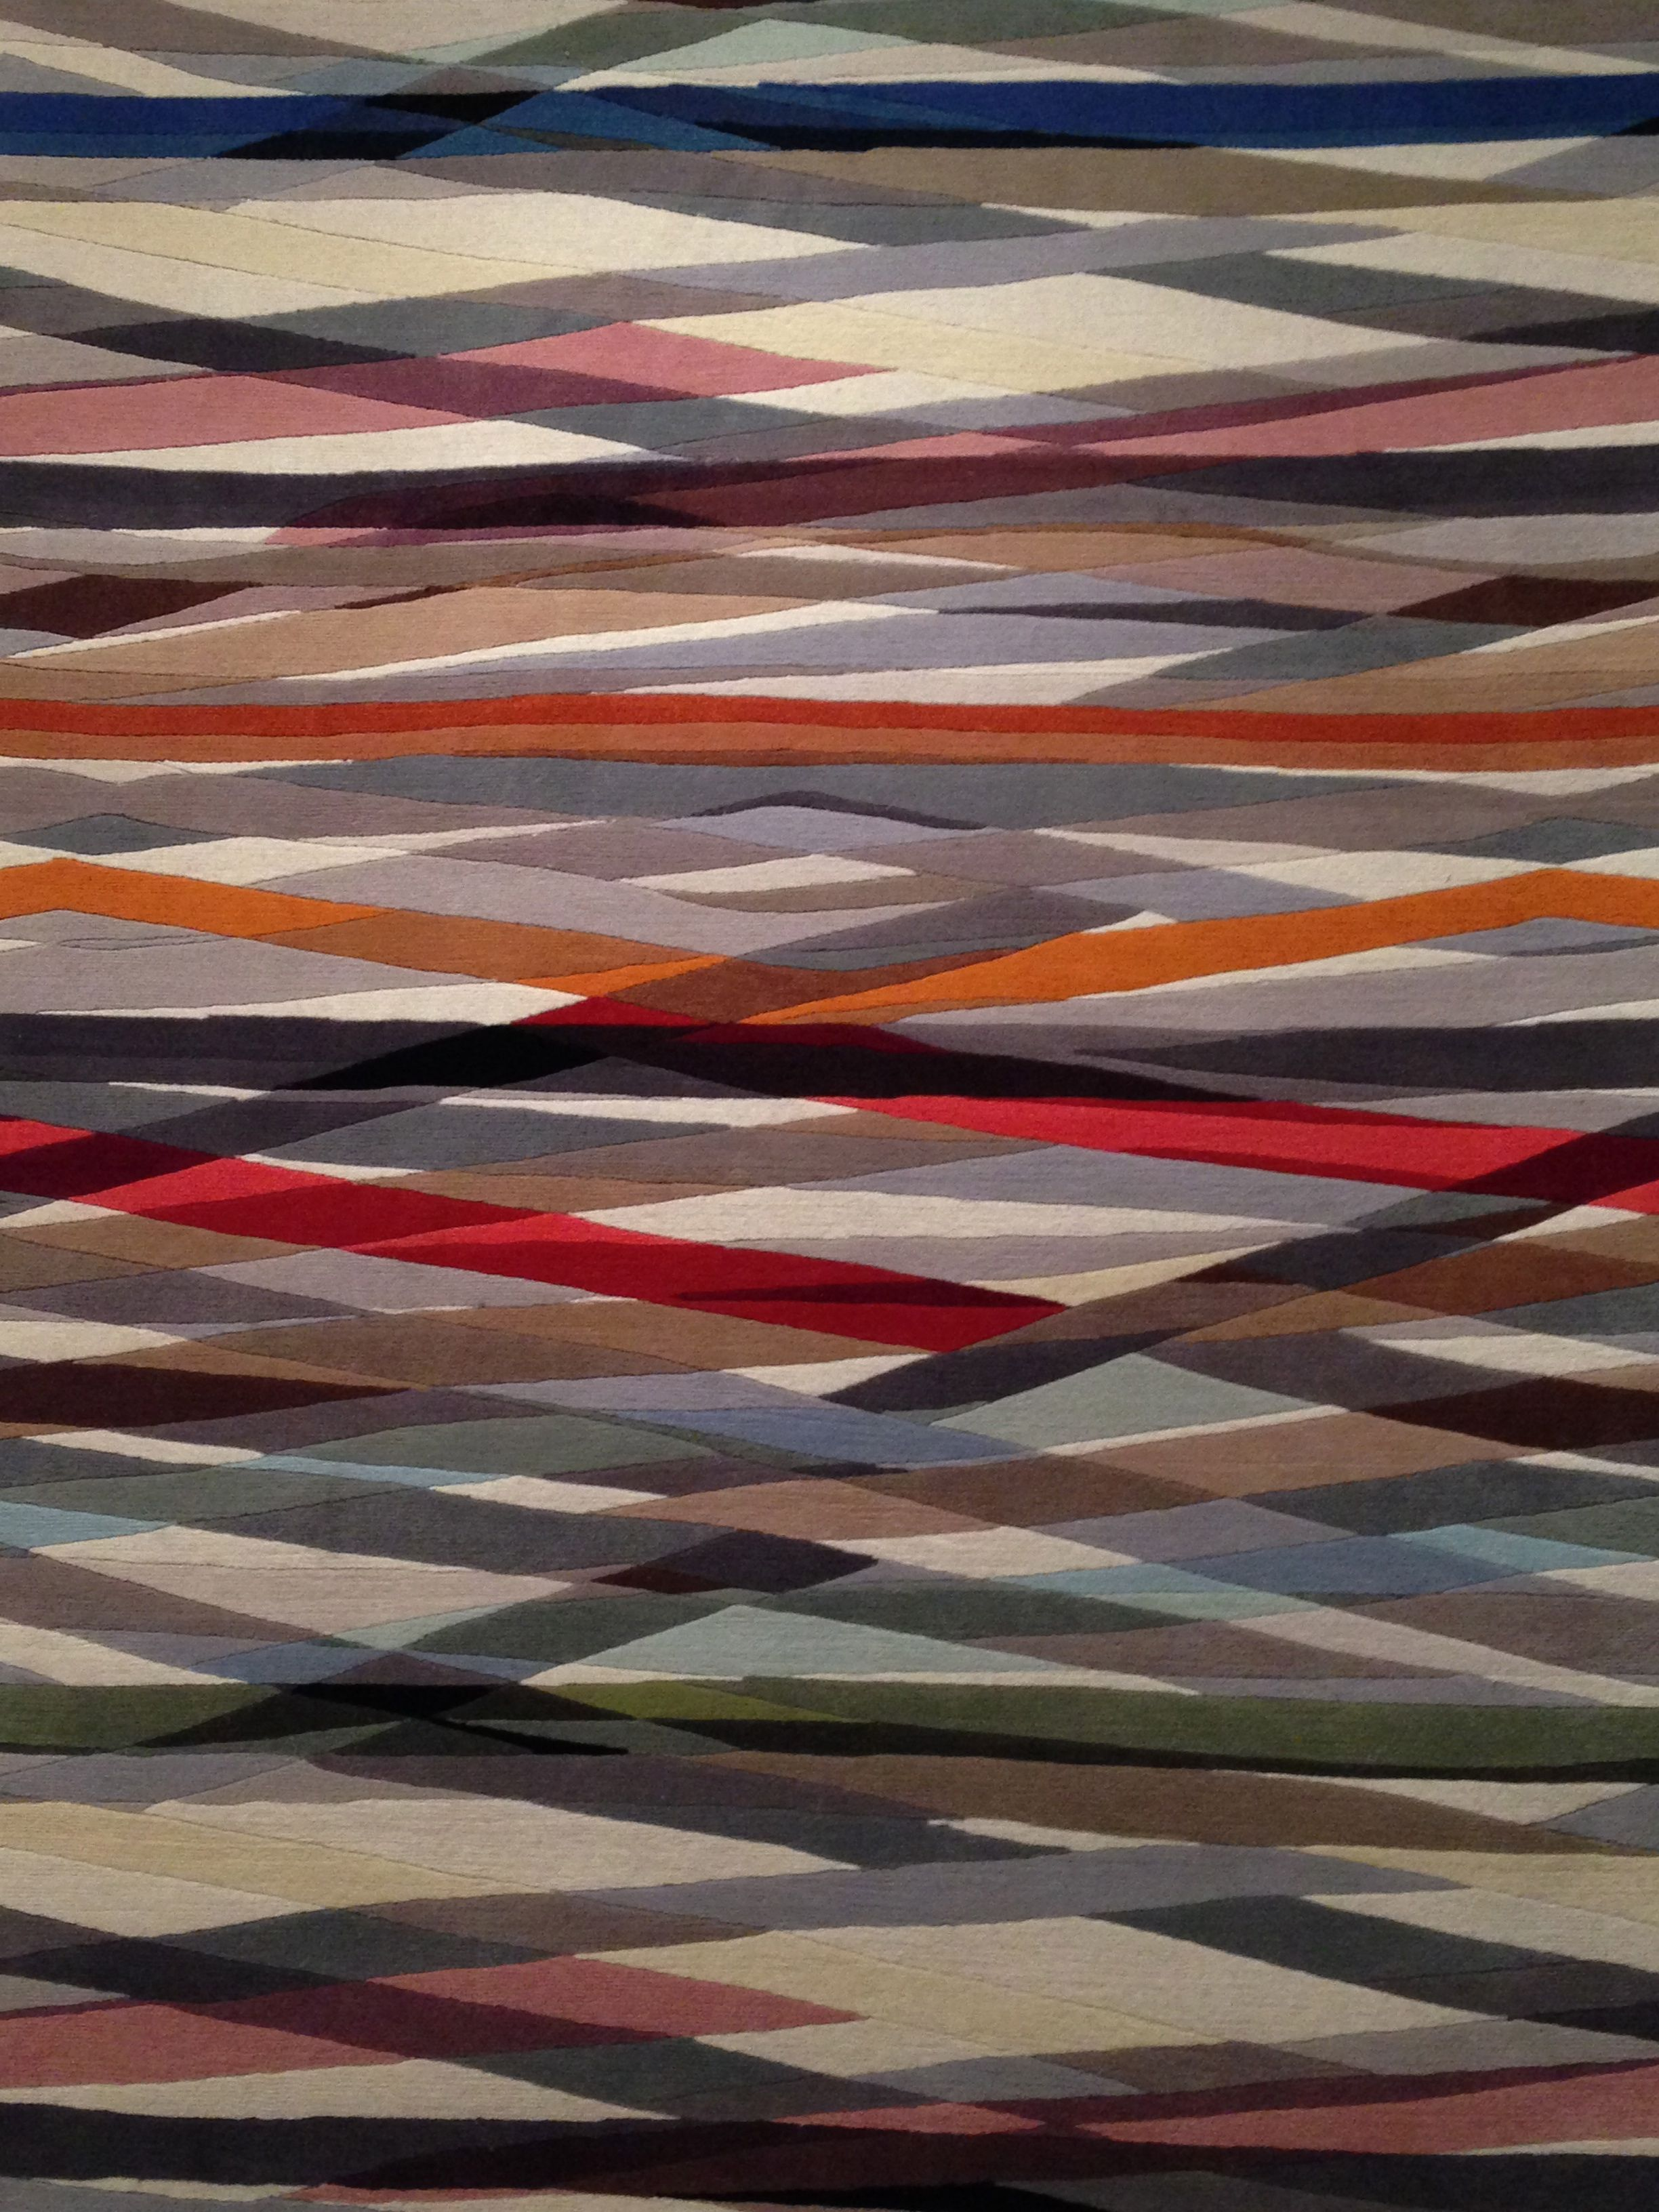 paul smith carpet - Google Search